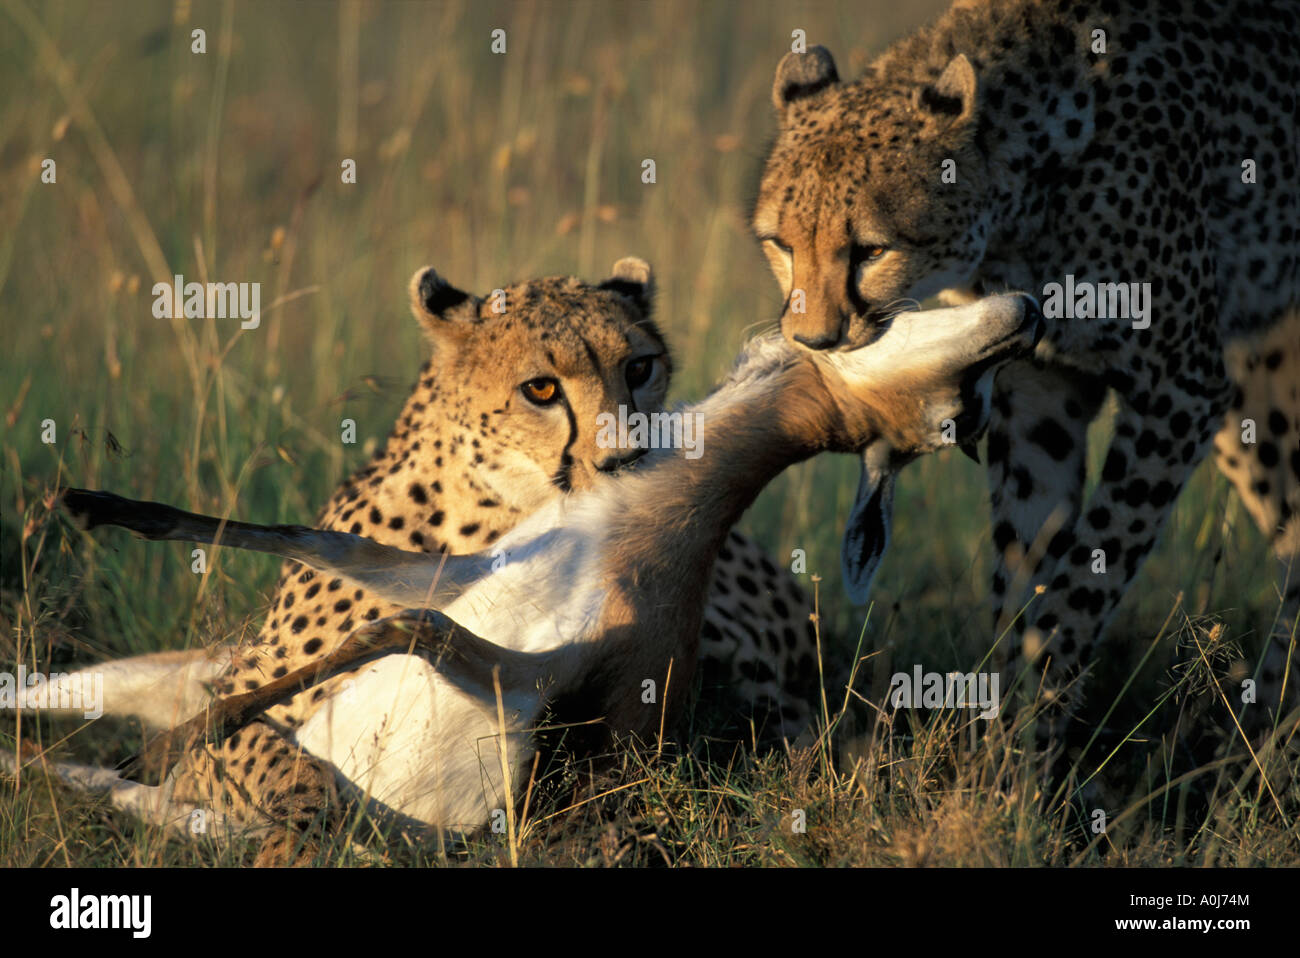 Kenya Masai Mara Game Reserve Two Cheetah Acinonyx jubatas suffocate Thomsons Gazelle Gazella thomsonii - Stock Image